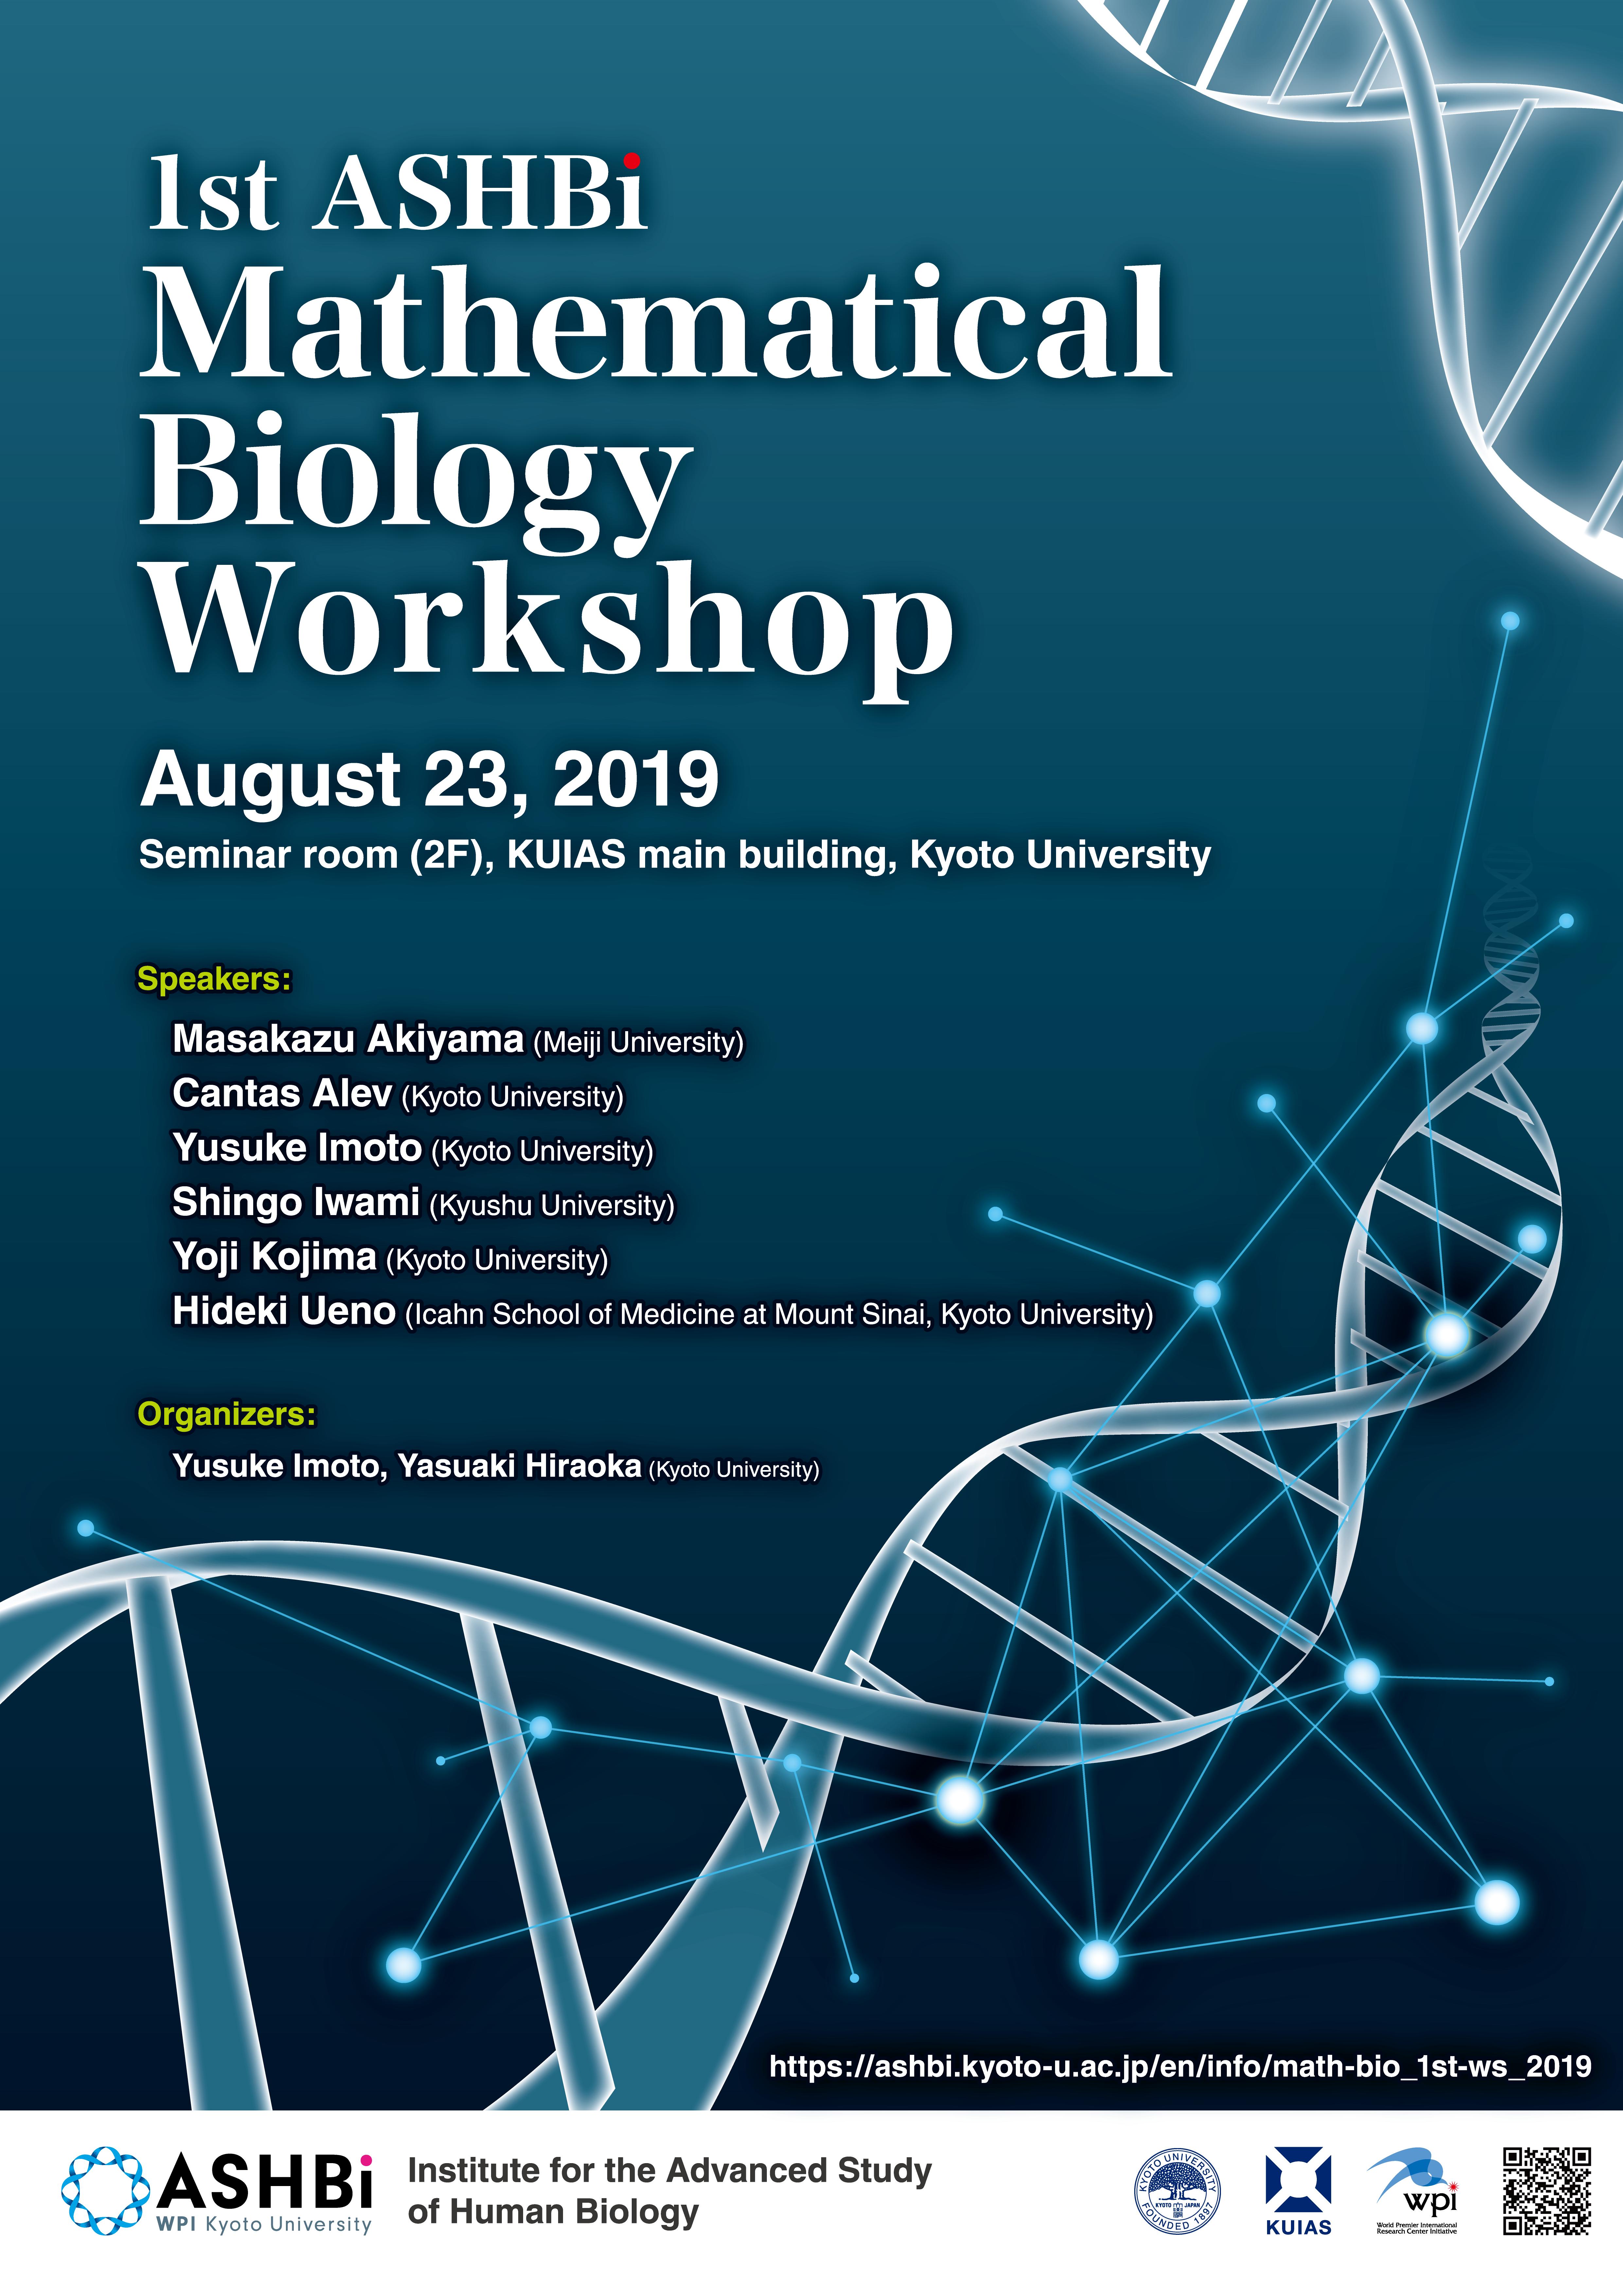 ASHBi Mathematical Biology Workshop